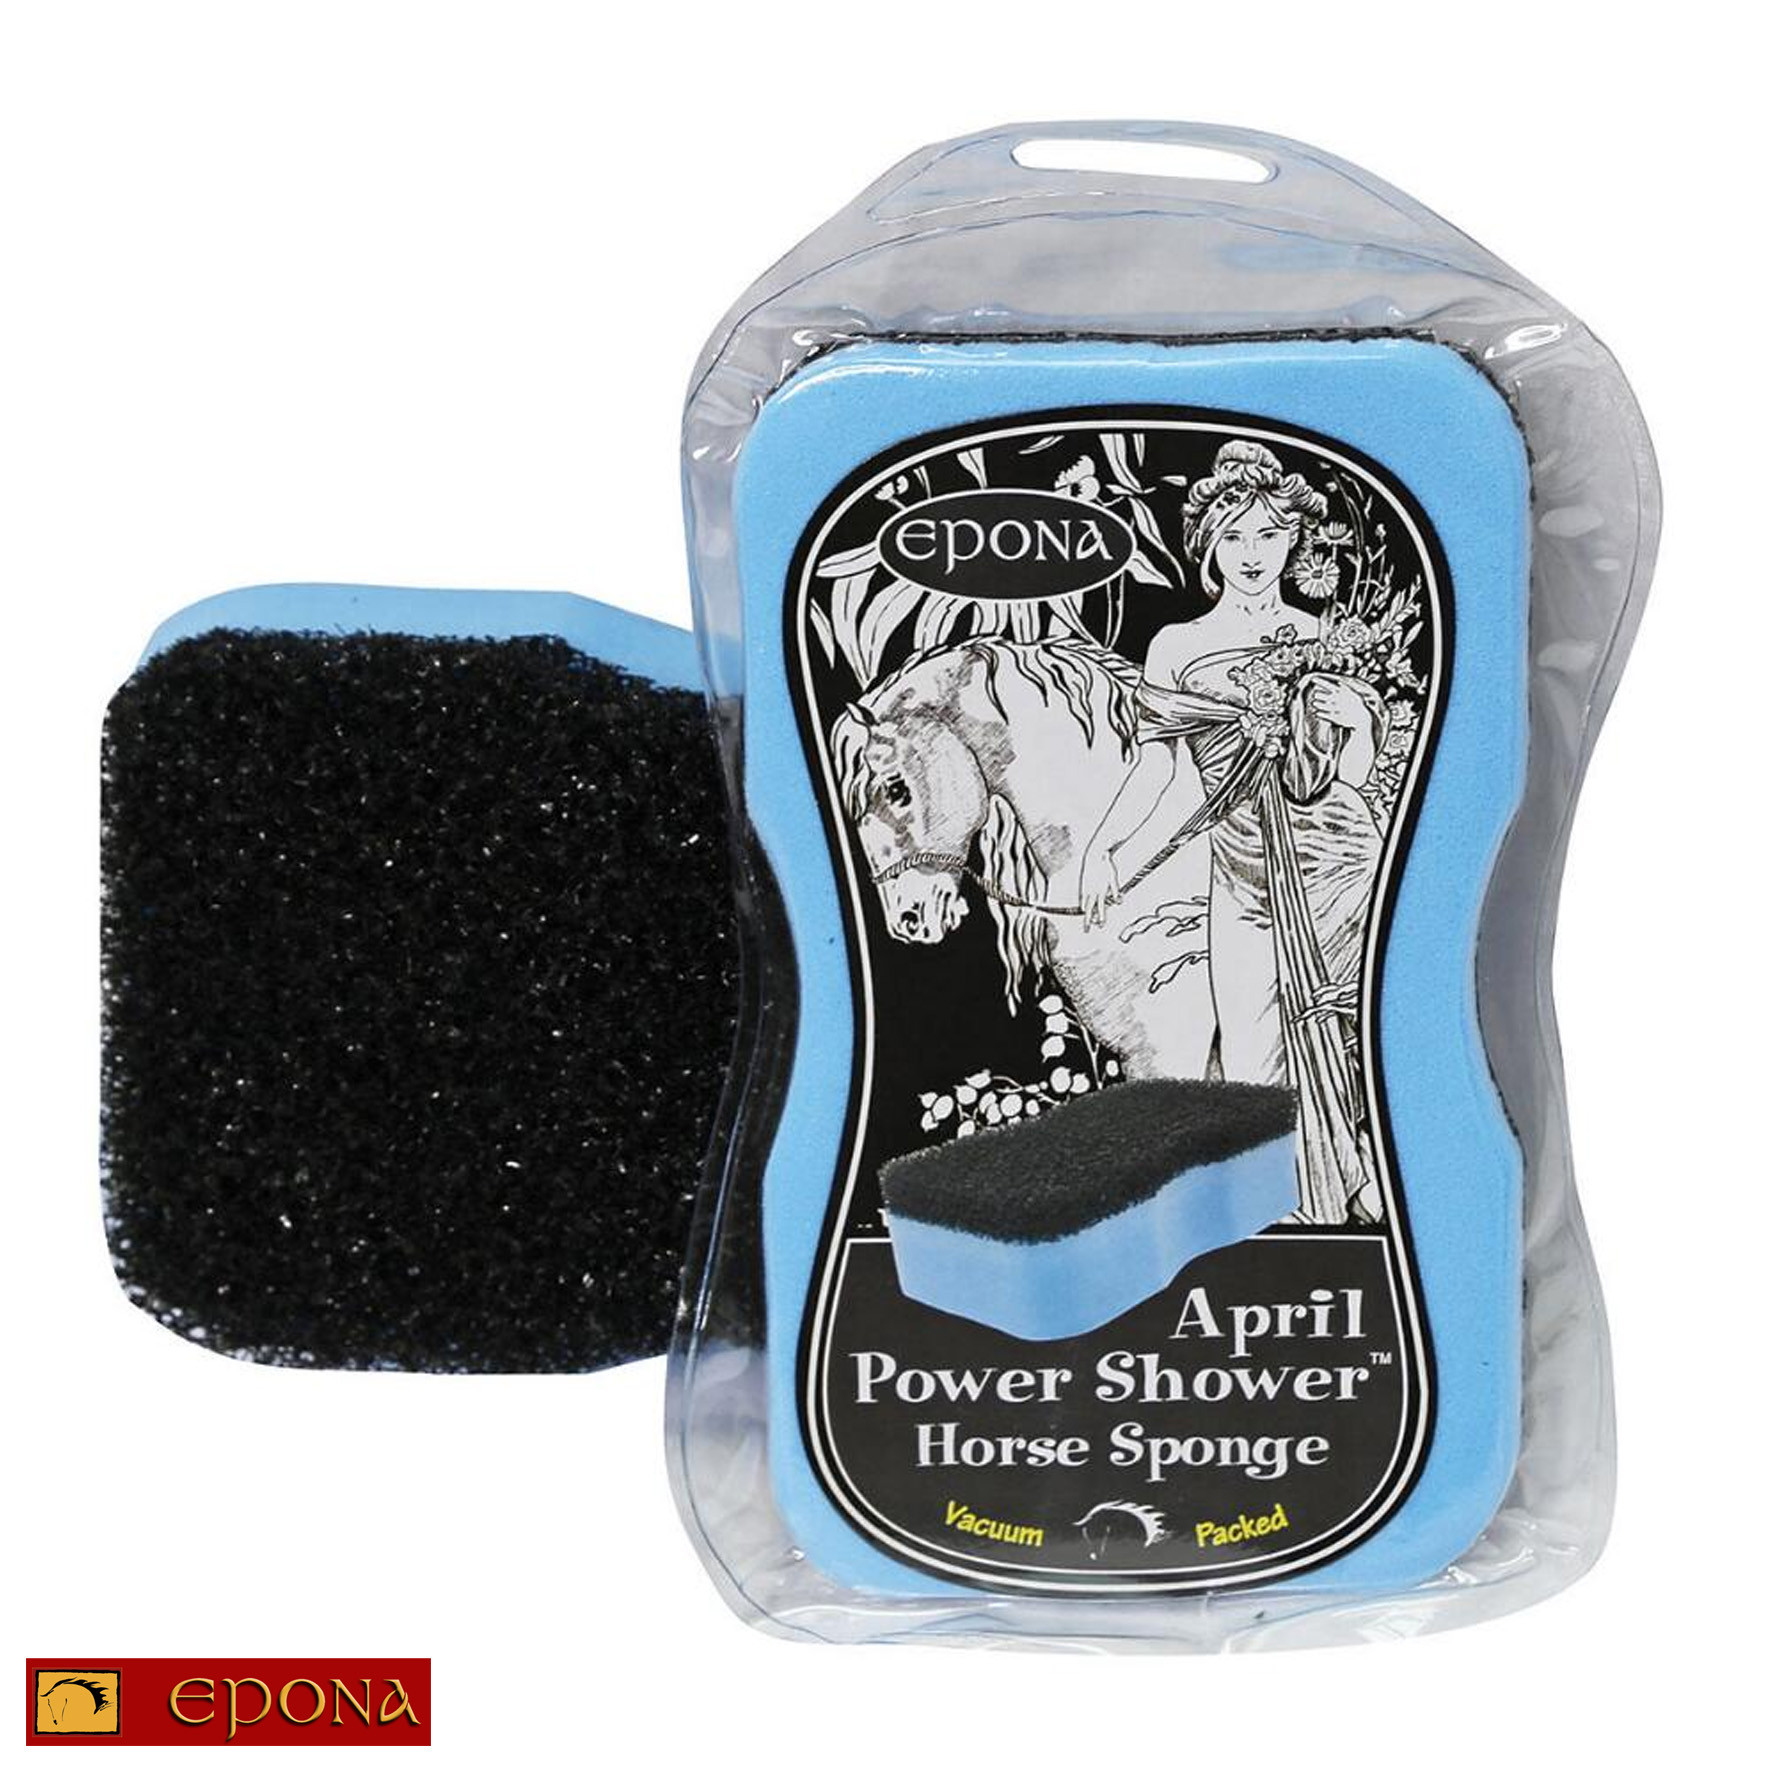 April Shower Sponge